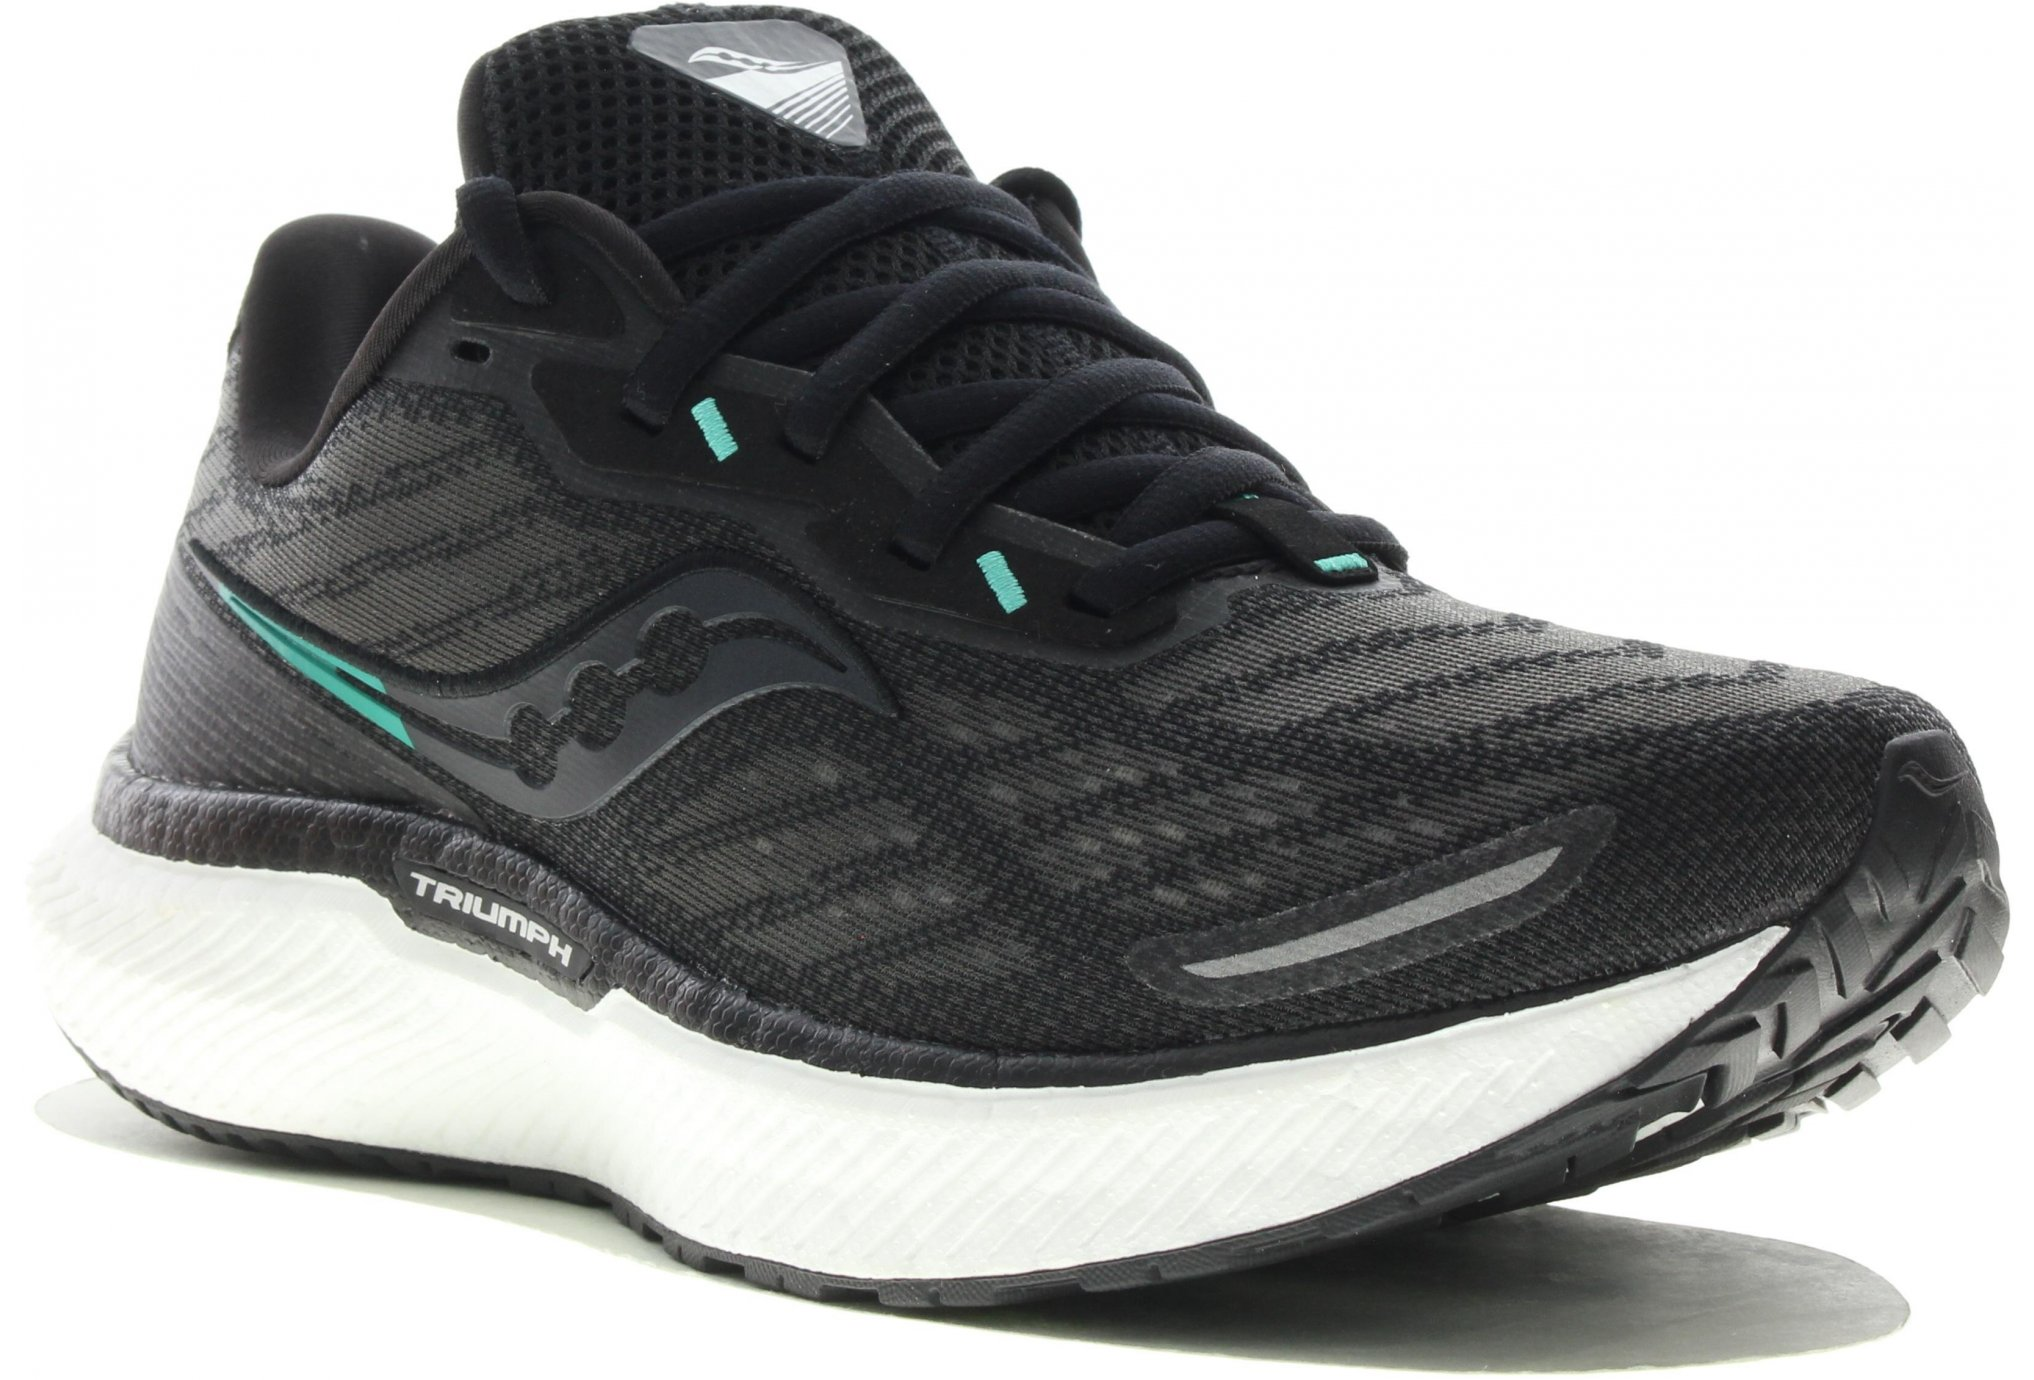 Saucony Triumph 19 W Chaussures running femme